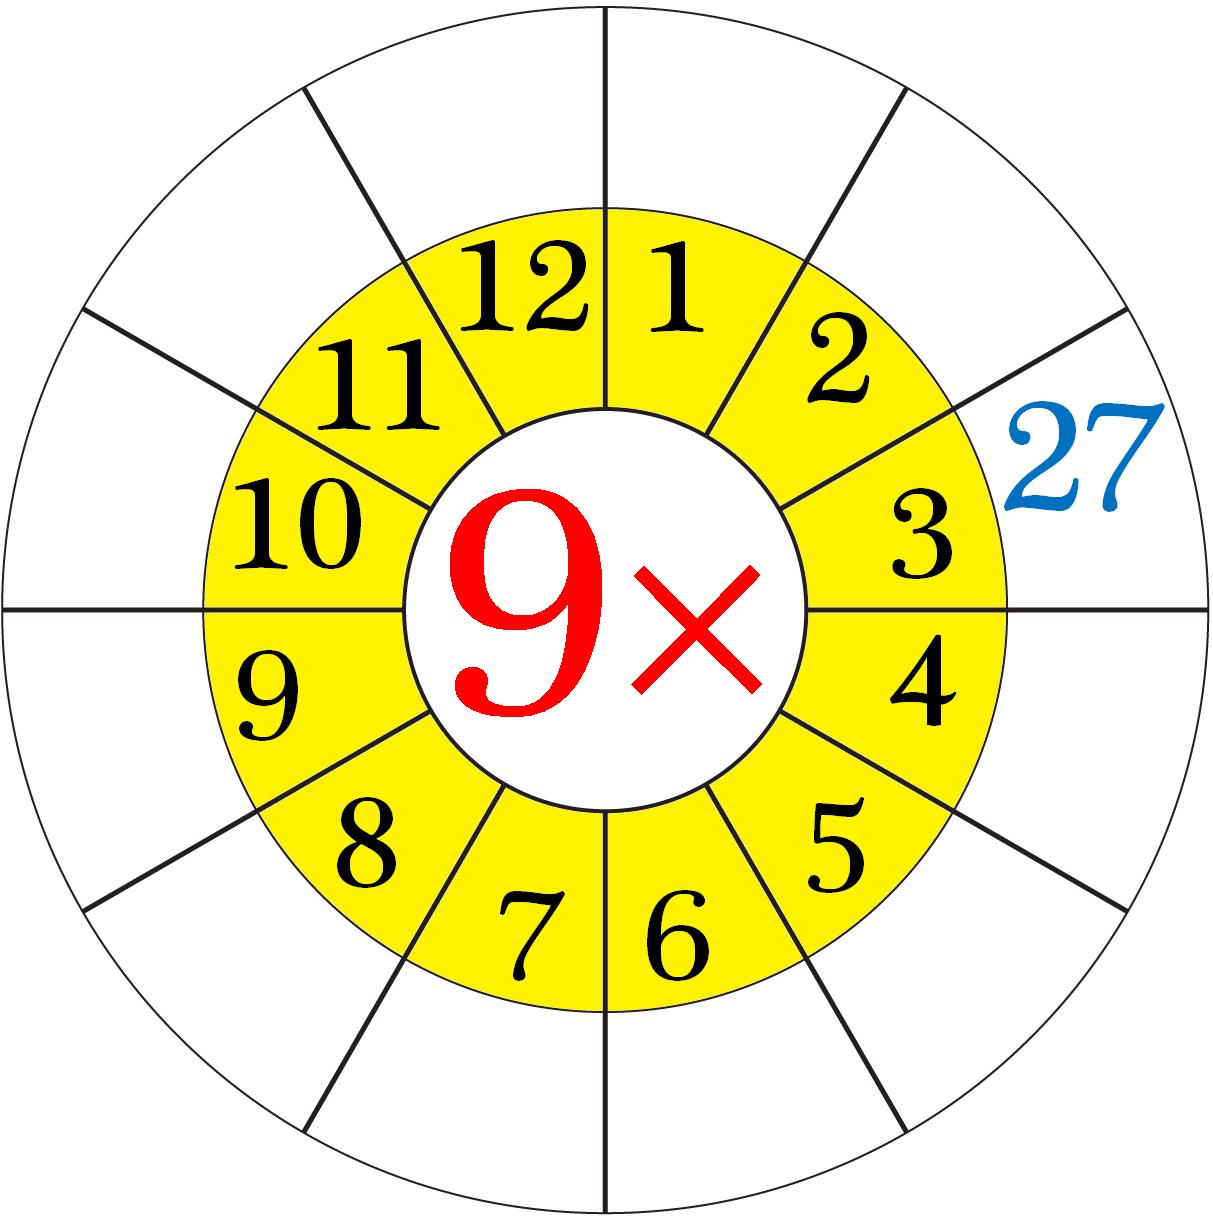 Worksheet On Multiplication Table Of 9 | Word Problems On 9 intended for Multiplication Worksheets 9S